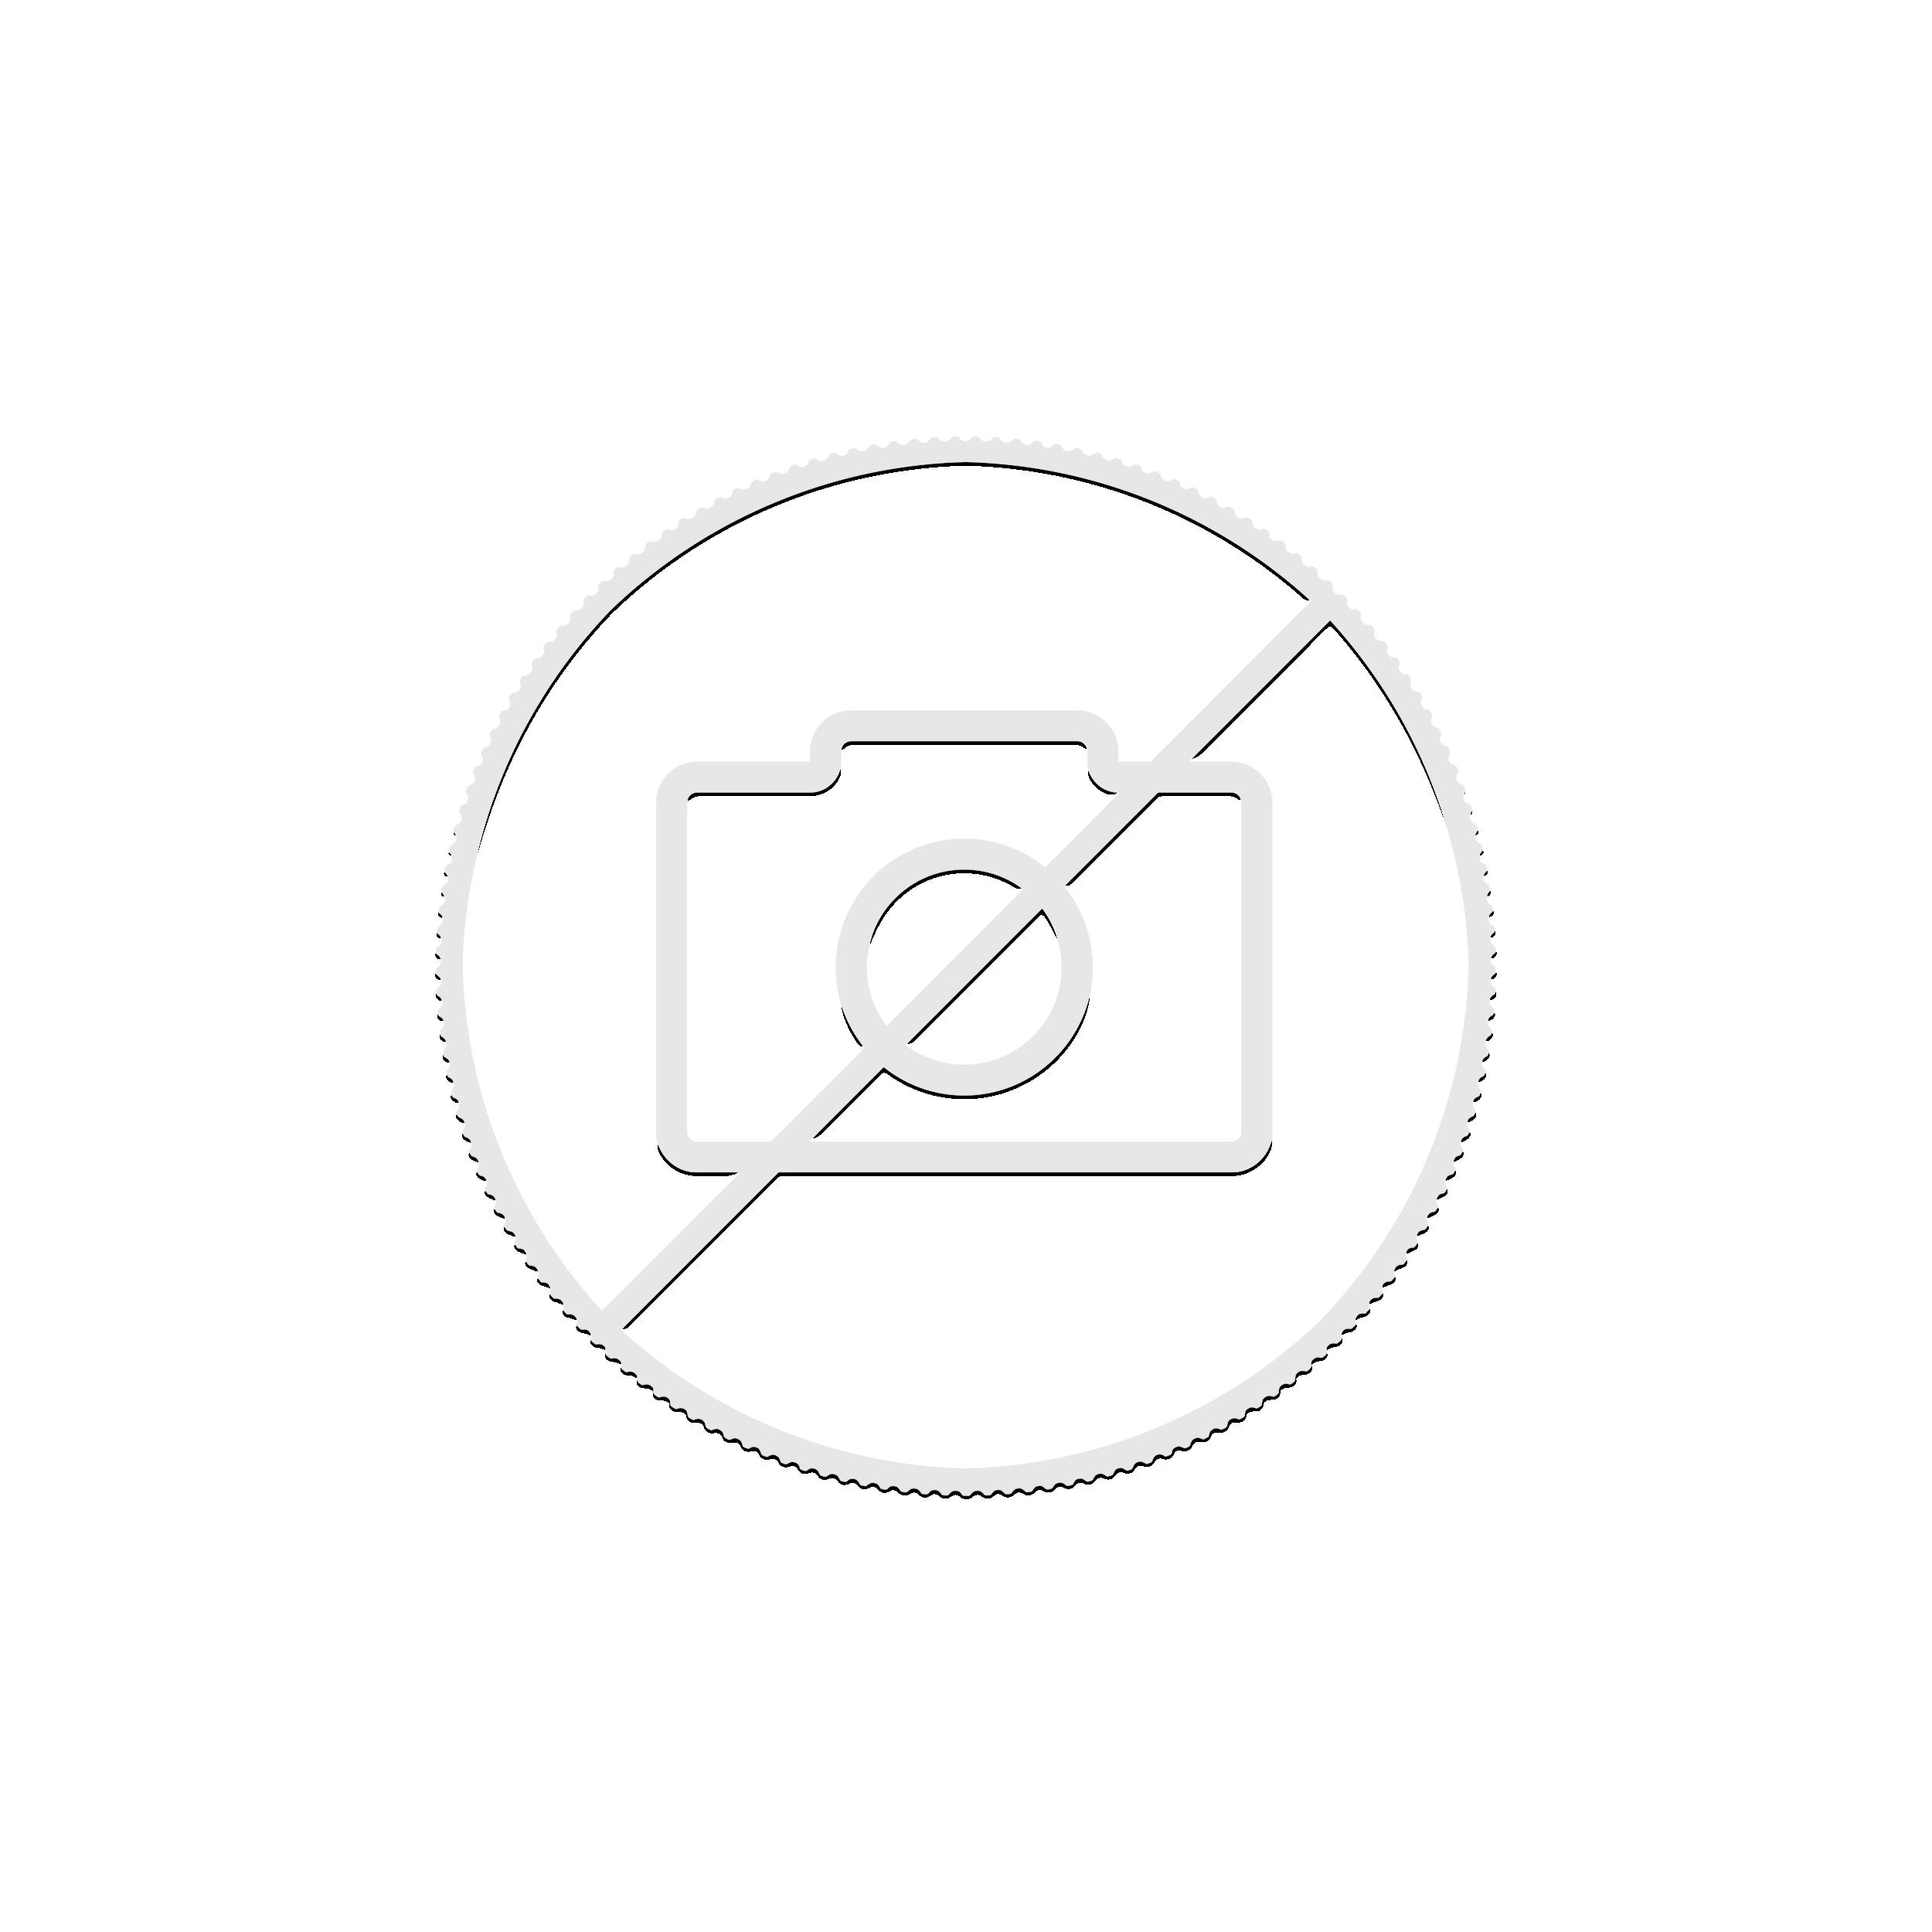 1/2 troy ounce zilveren munt Lunar 2022 Proof